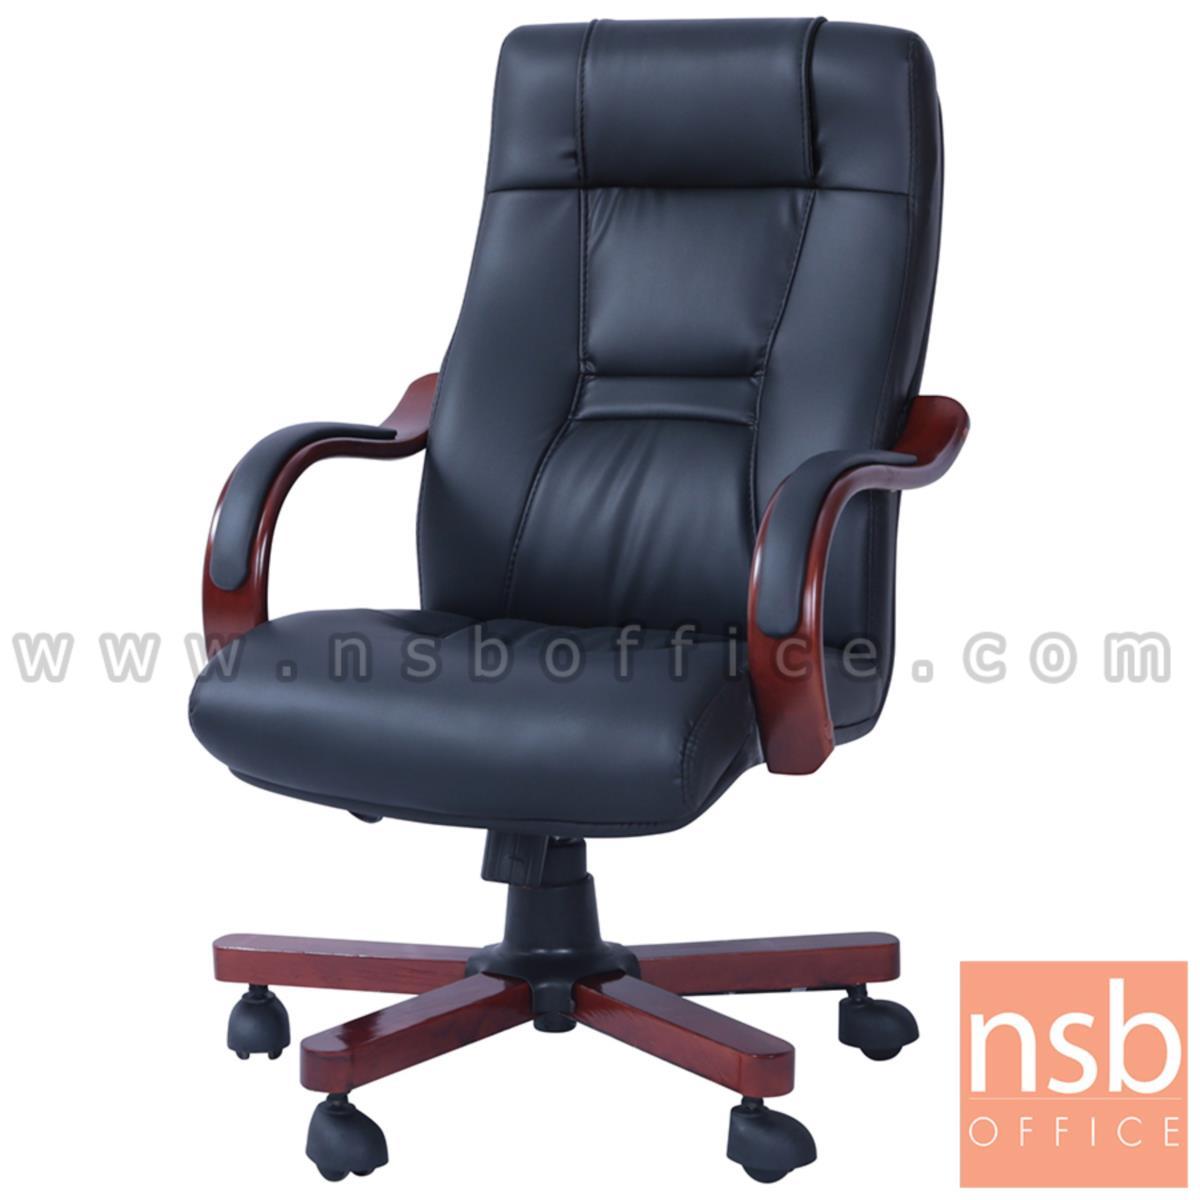 B25A090:เก้าอี้ผู้บริหารหนัง PU รุ่น FTS-MA-3760  โช๊คแก๊ส มีก้อนโยก ขาไม้